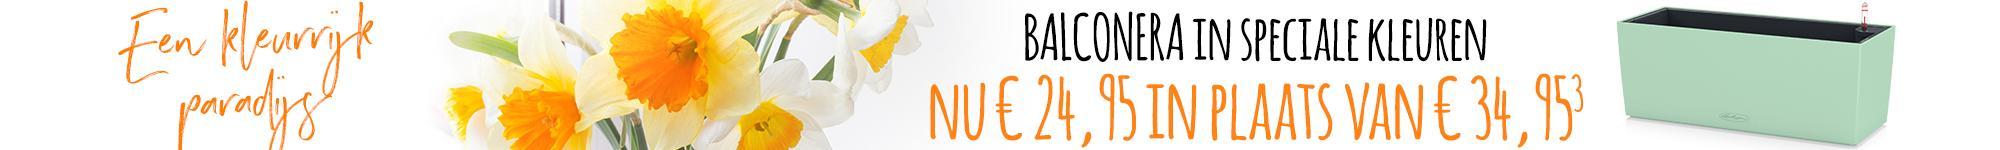 le_listing_banner_balconera_02221_nl